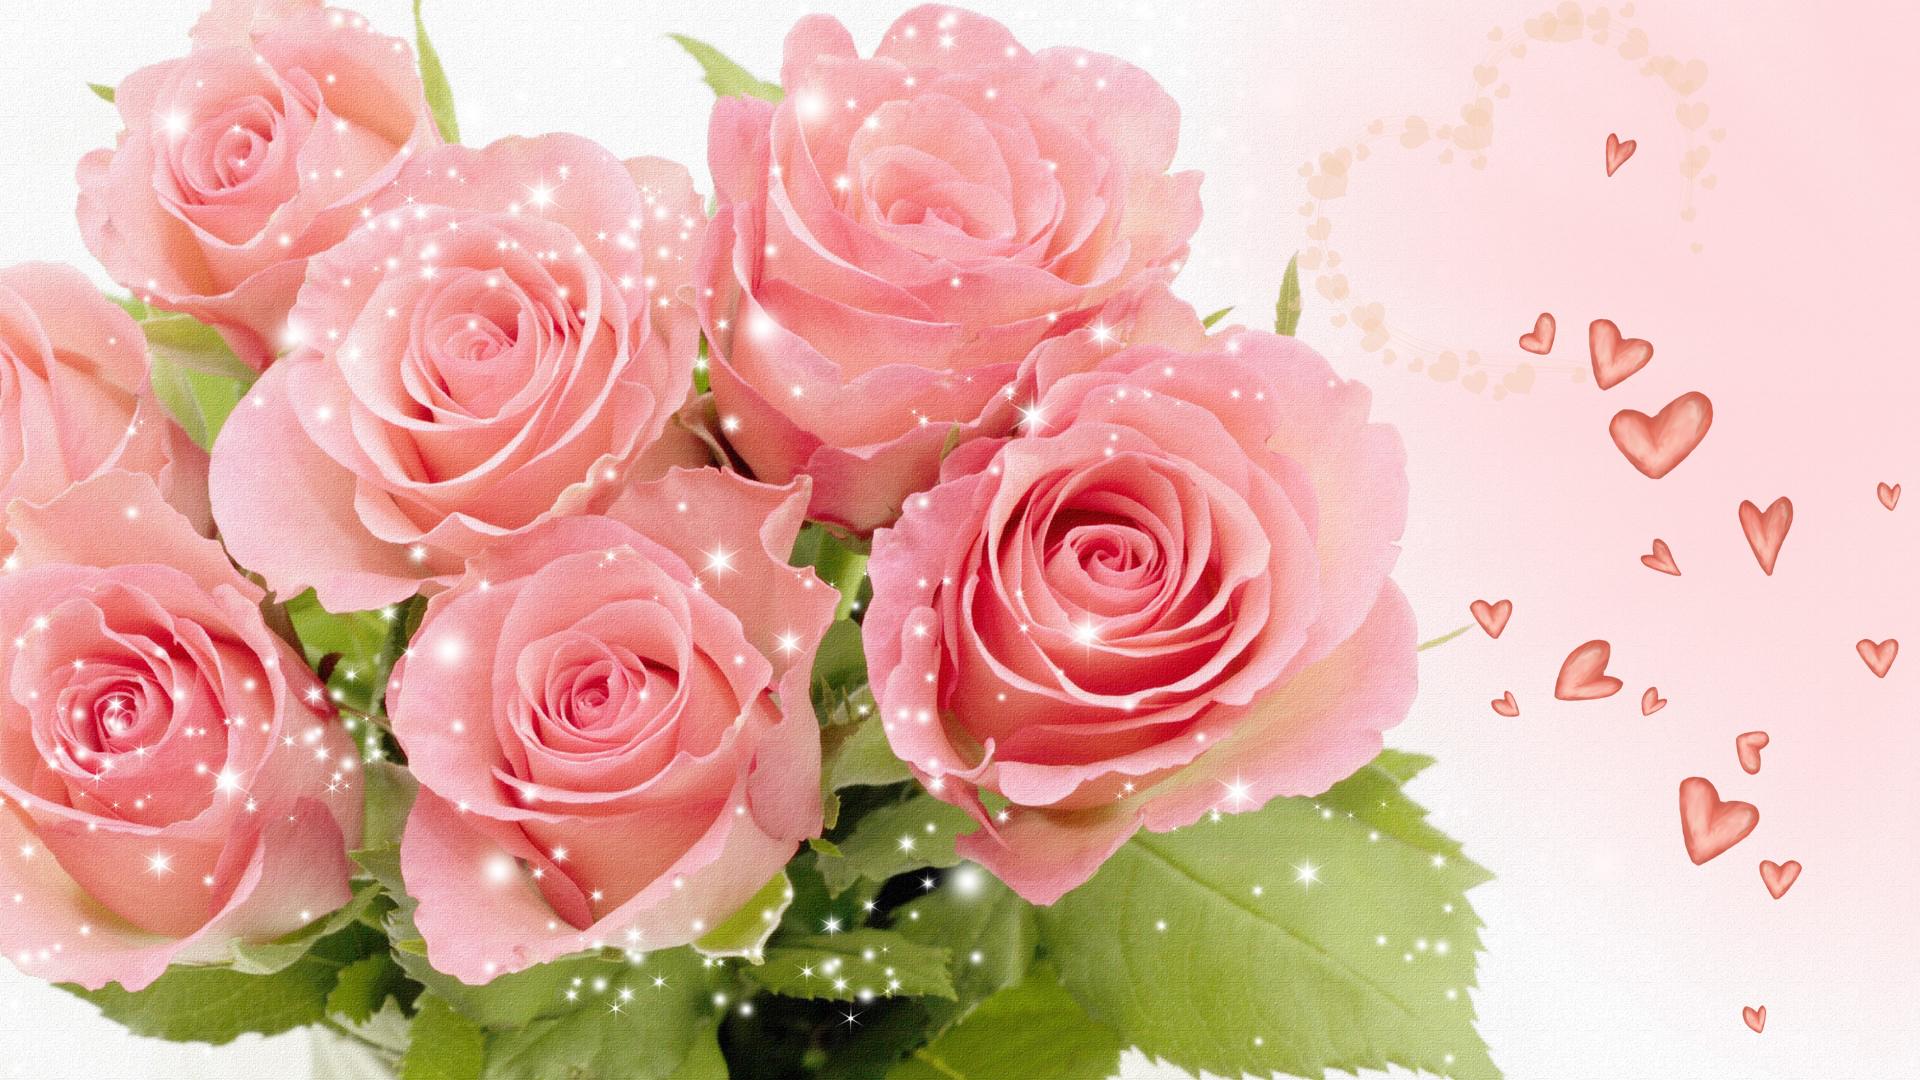 Роза  № 1599343 без смс